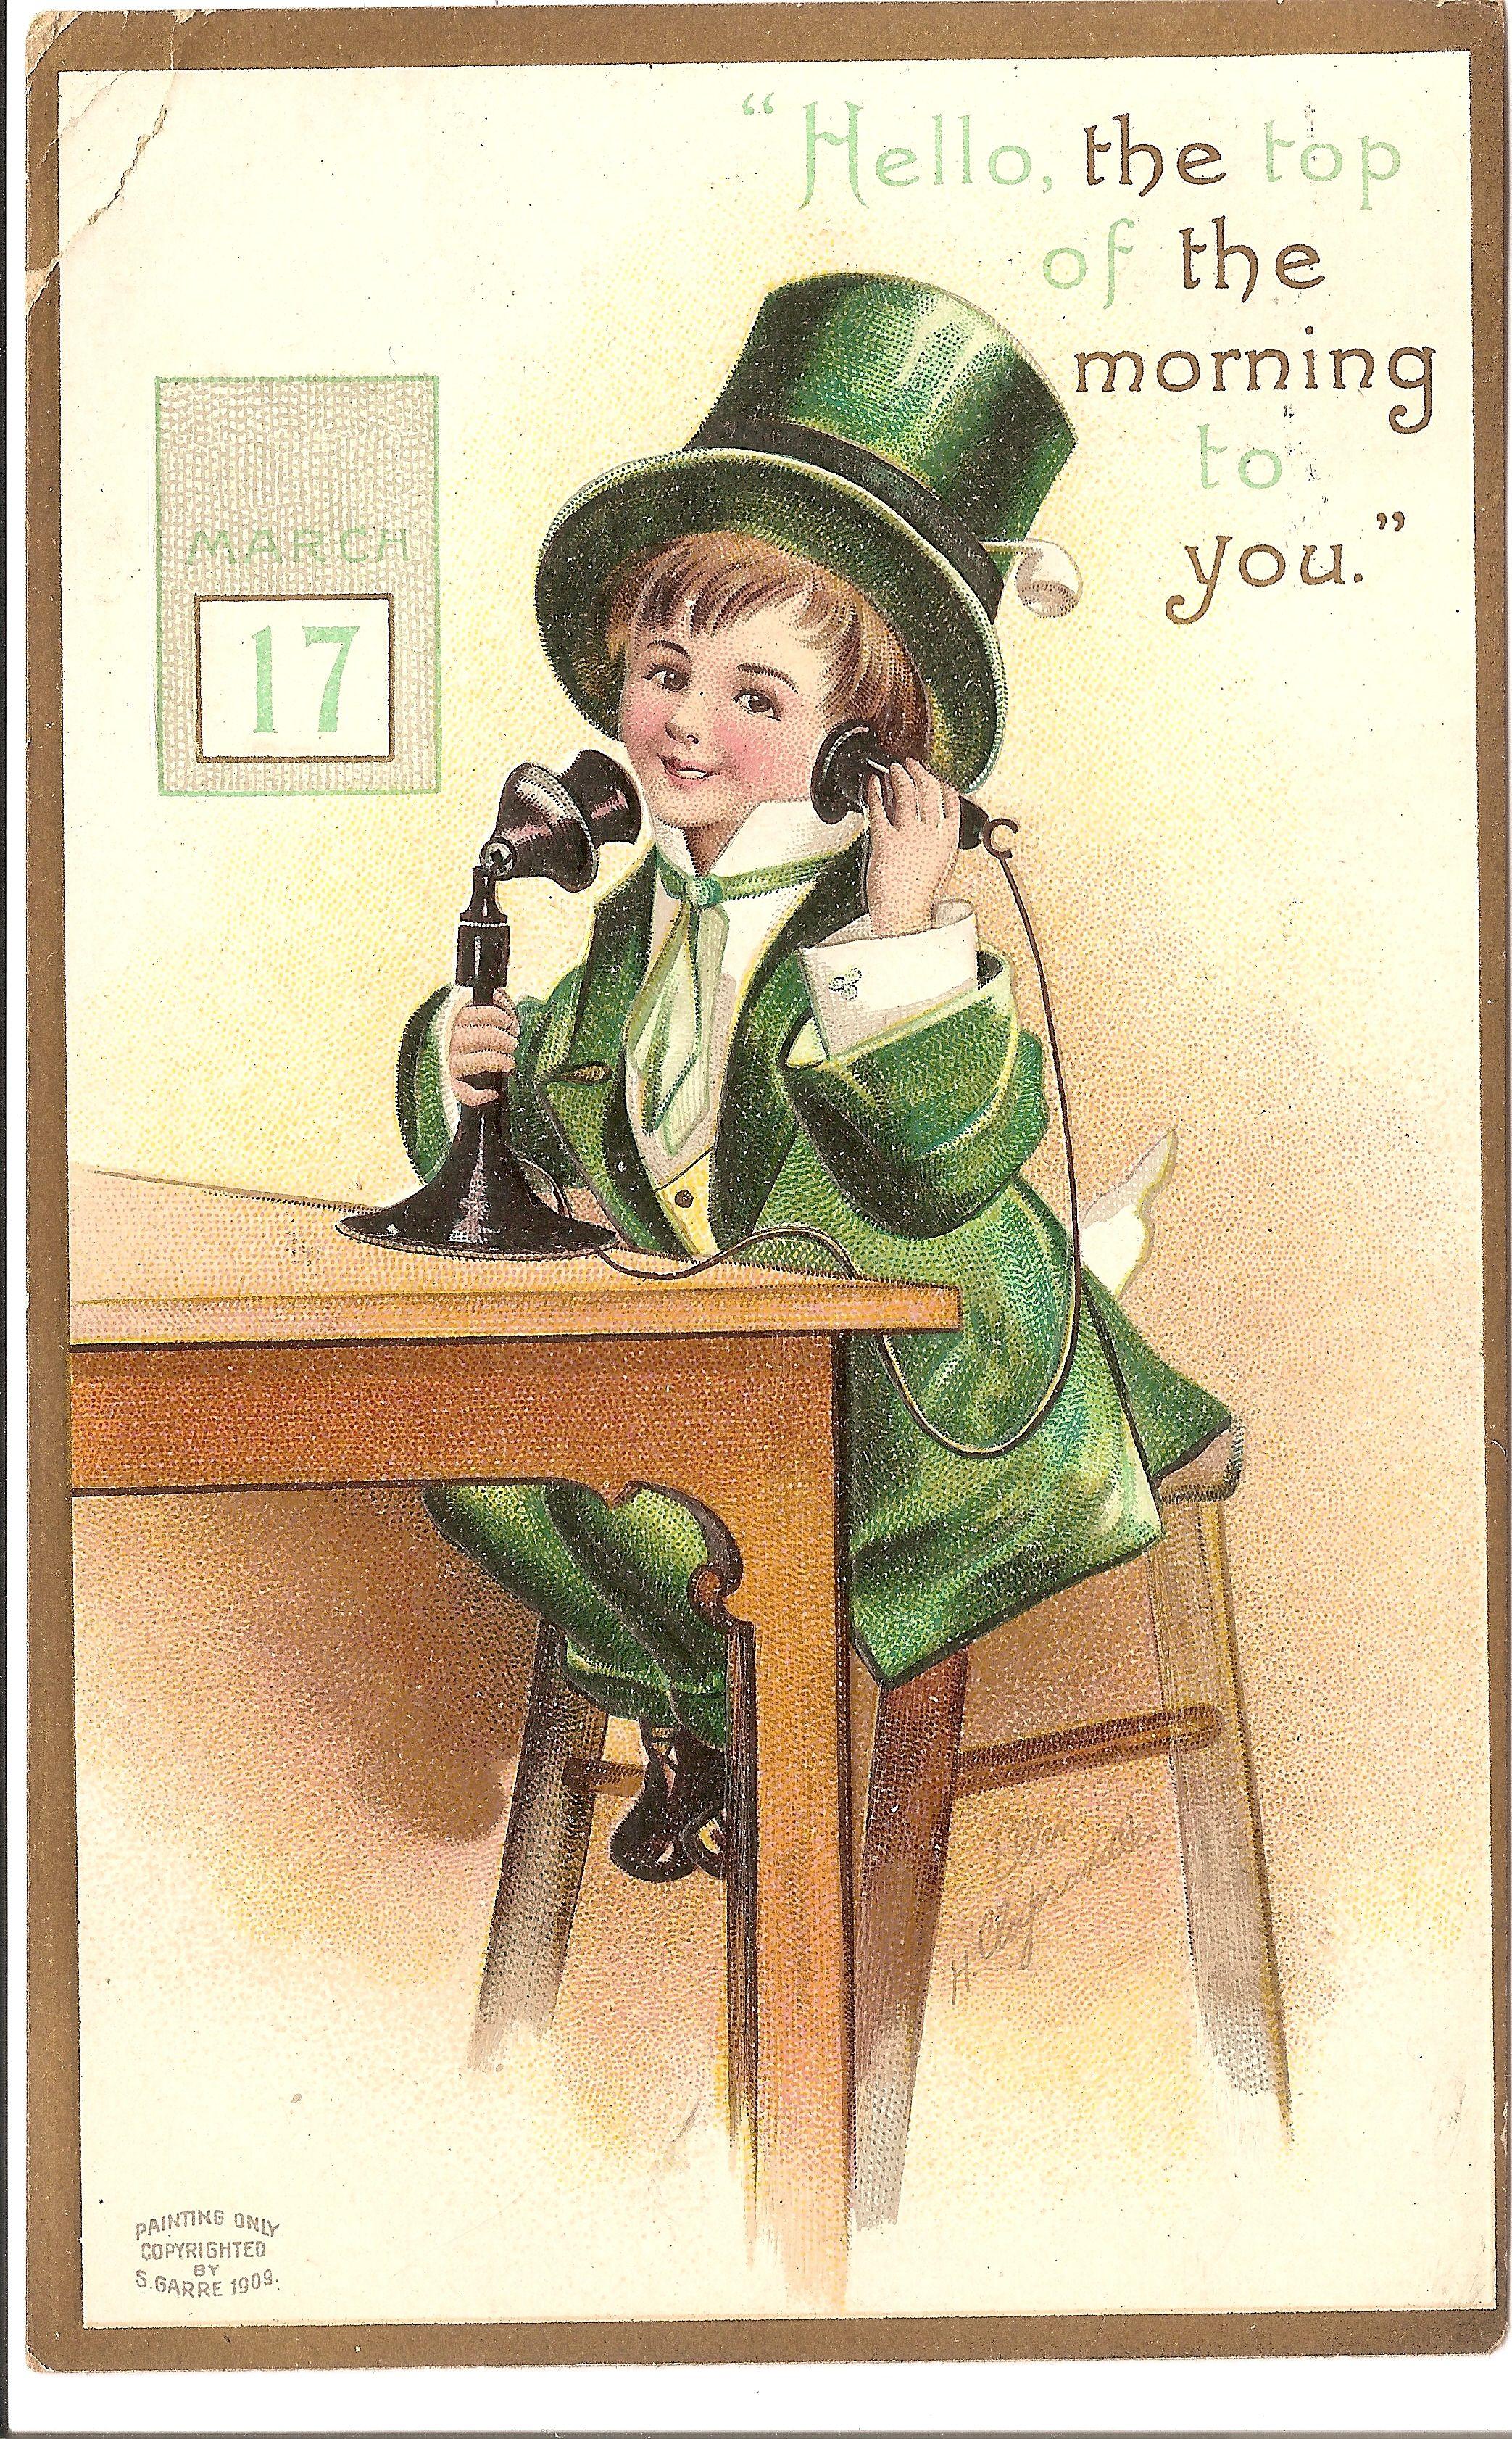 Leprechaun Sends Spring Greetings A Vintage Postcard For Wordless